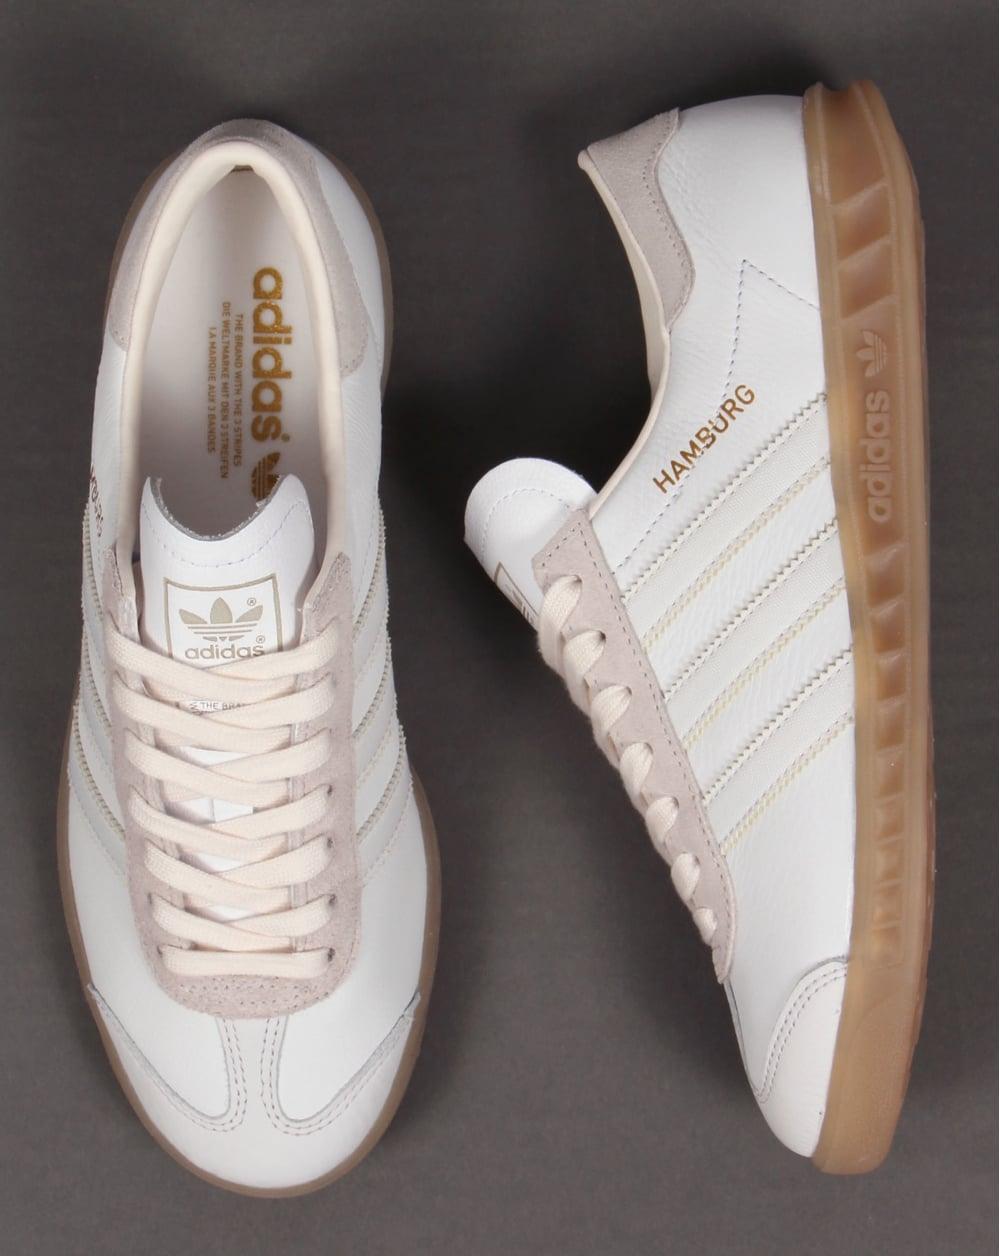 Adidas Hamburg White Trainers, Leather